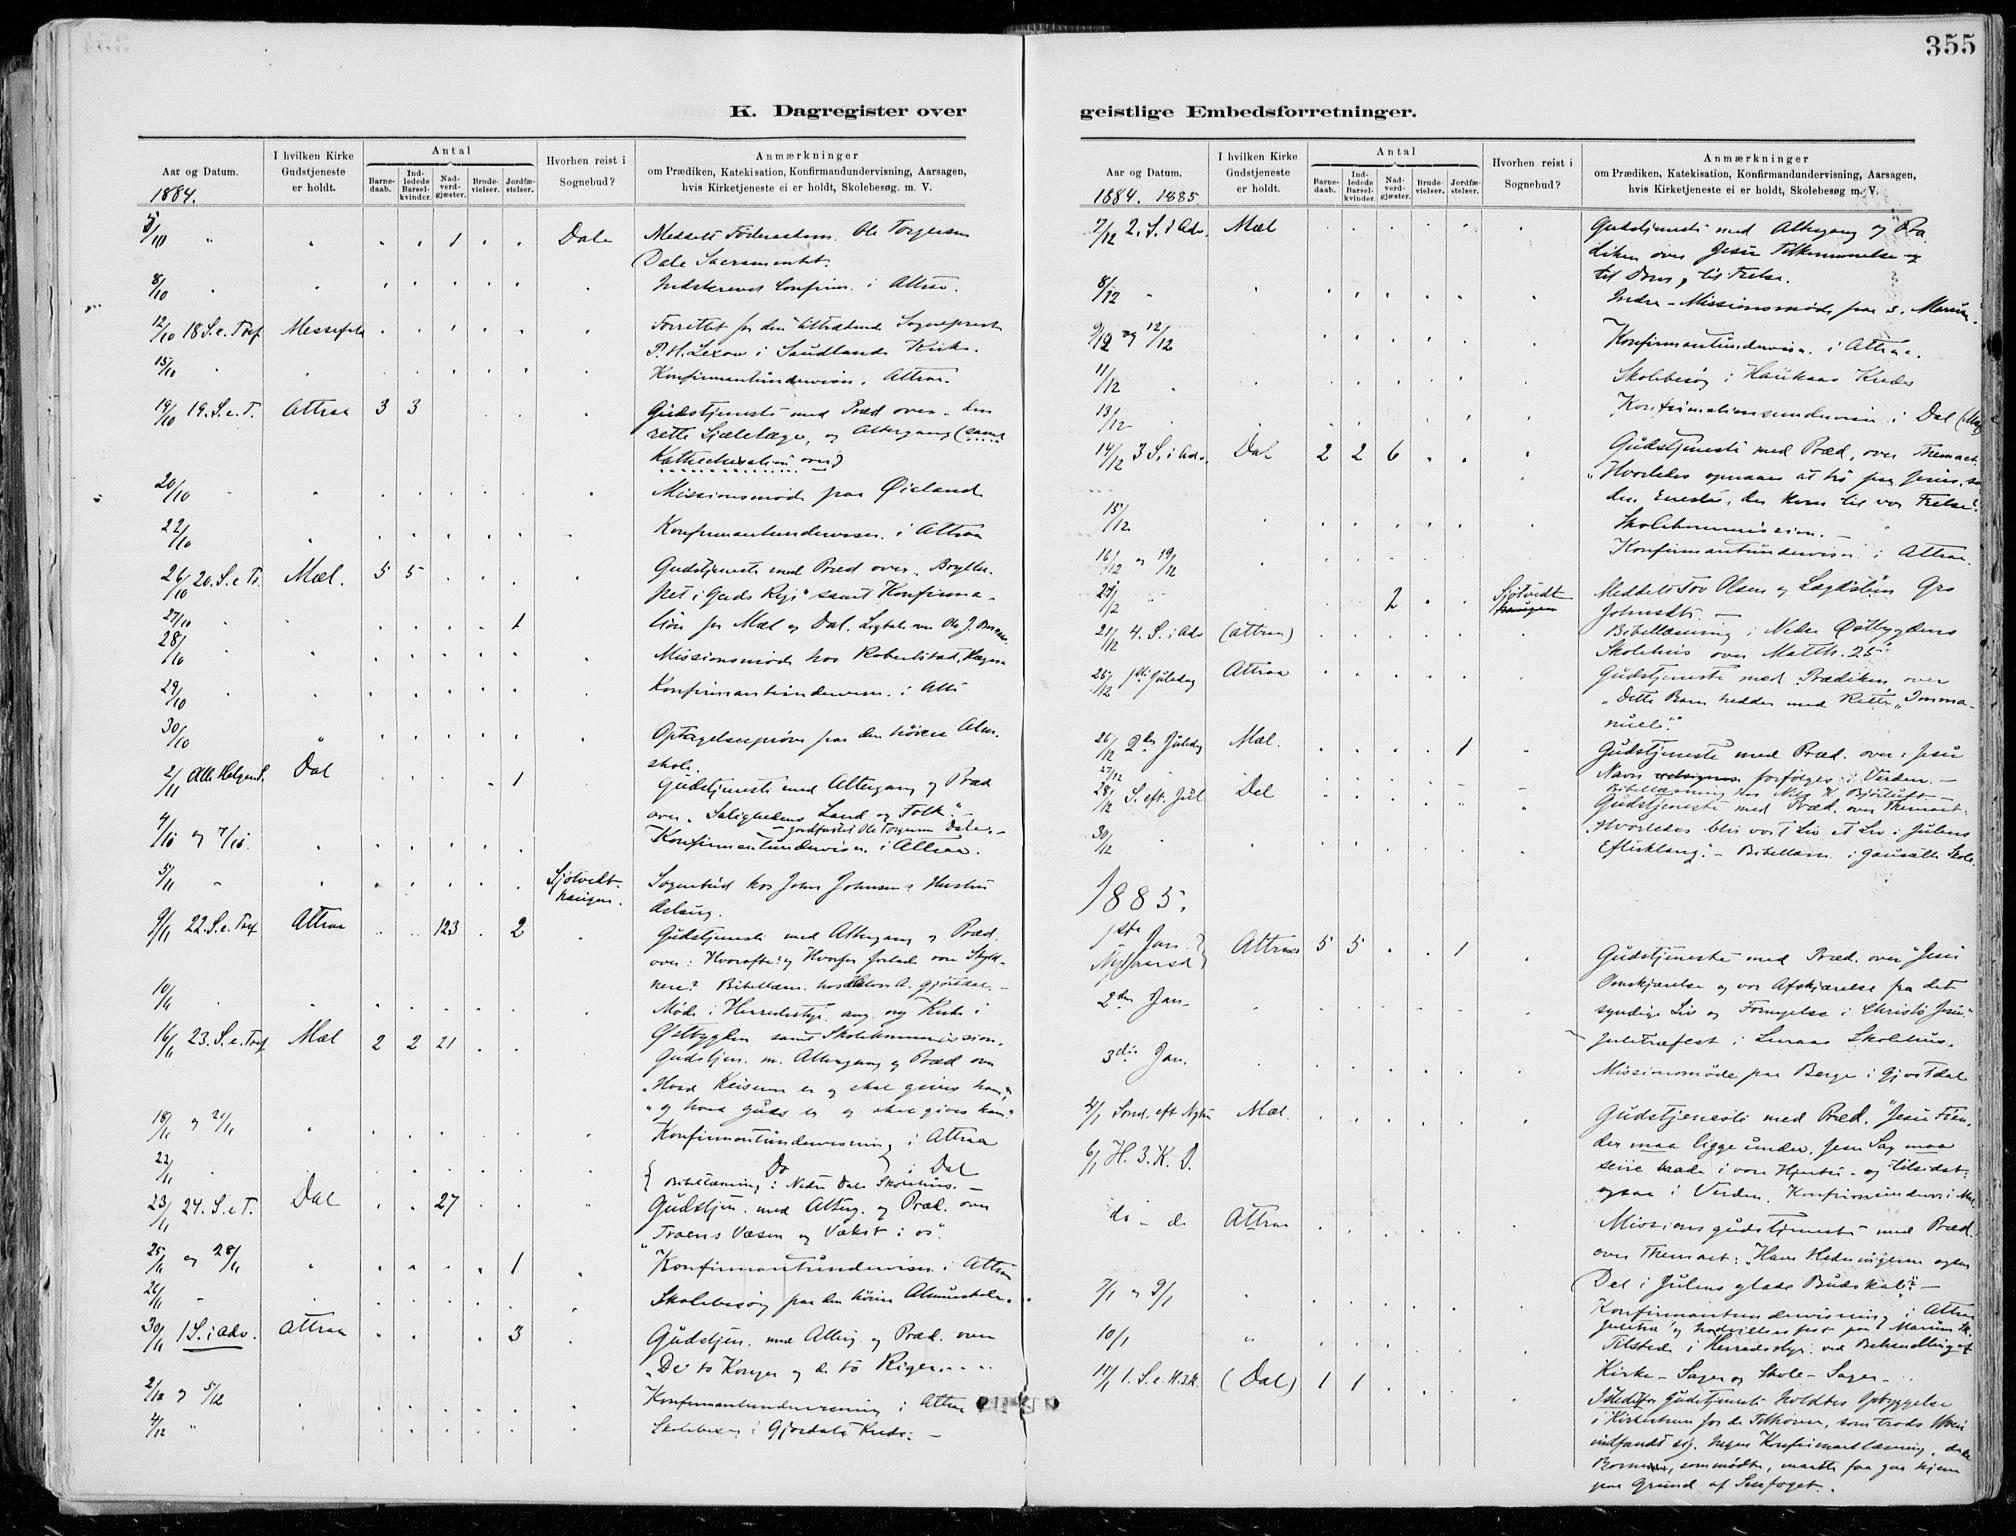 SAKO, Tinn kirkebøker, F/Fa/L0007: Ministerialbok nr. I 7, 1878-1922, s. 355